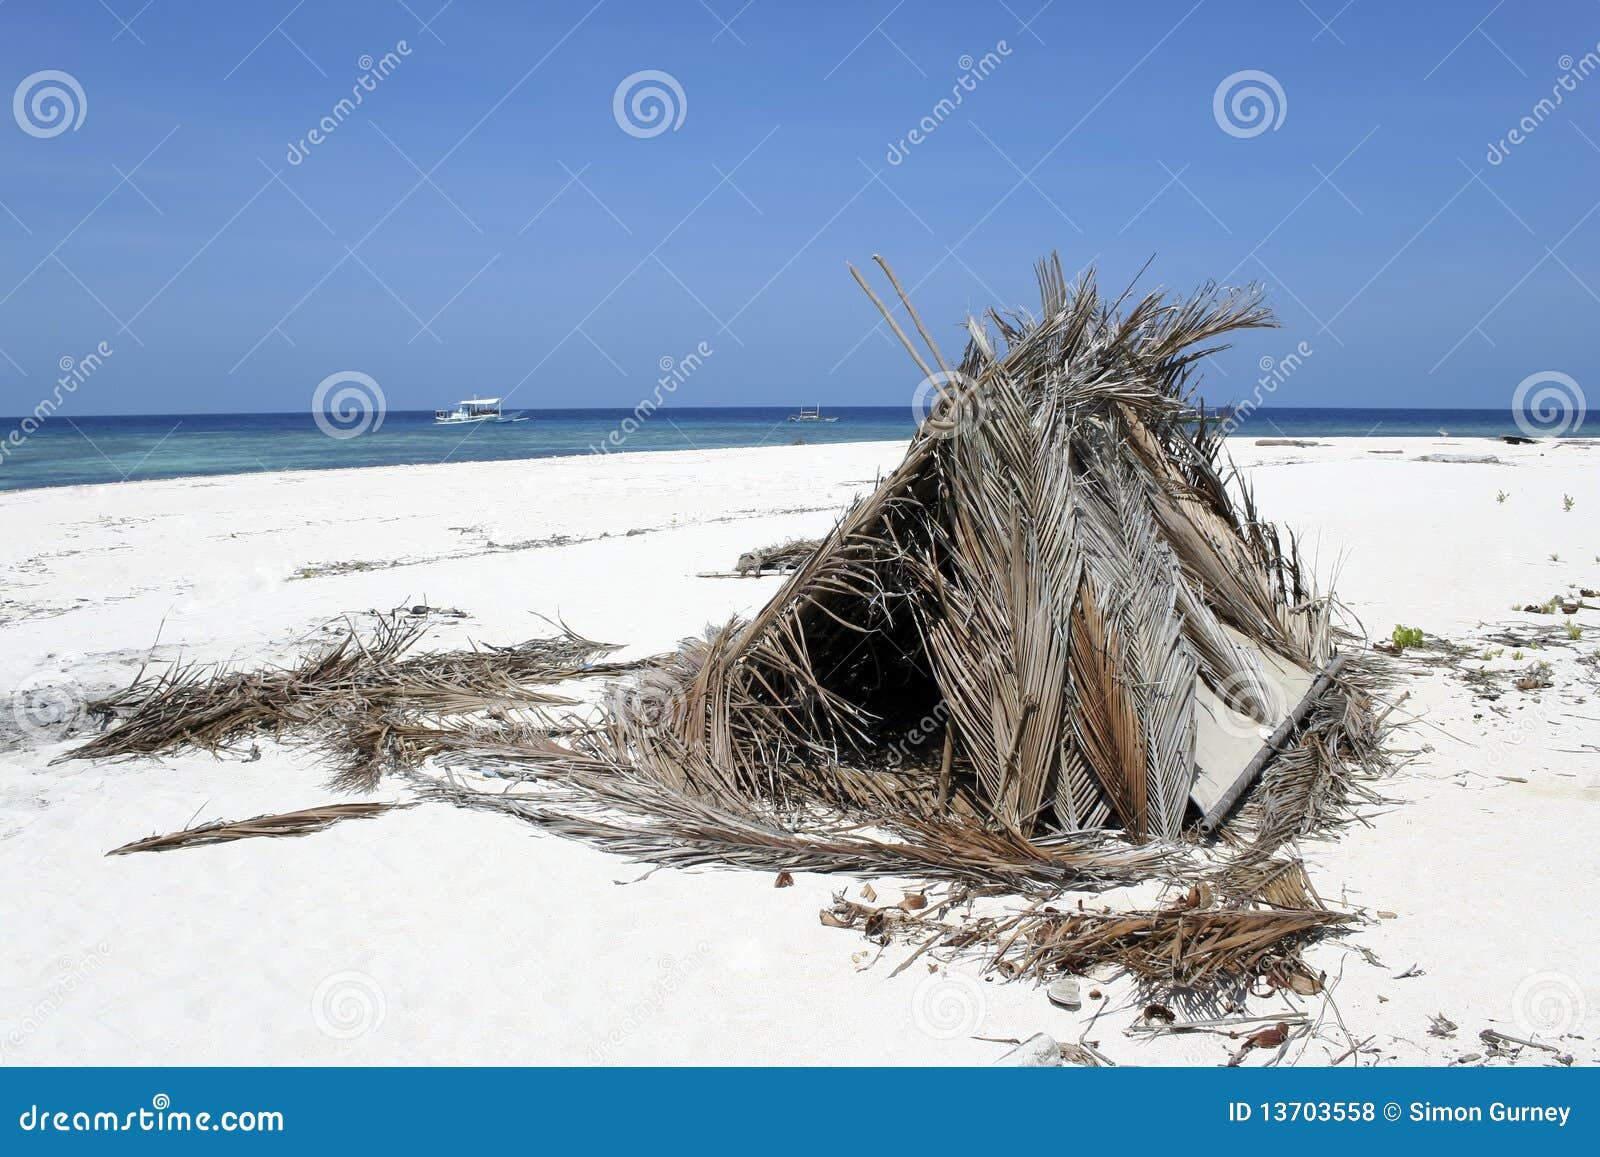 Desert Island Objects